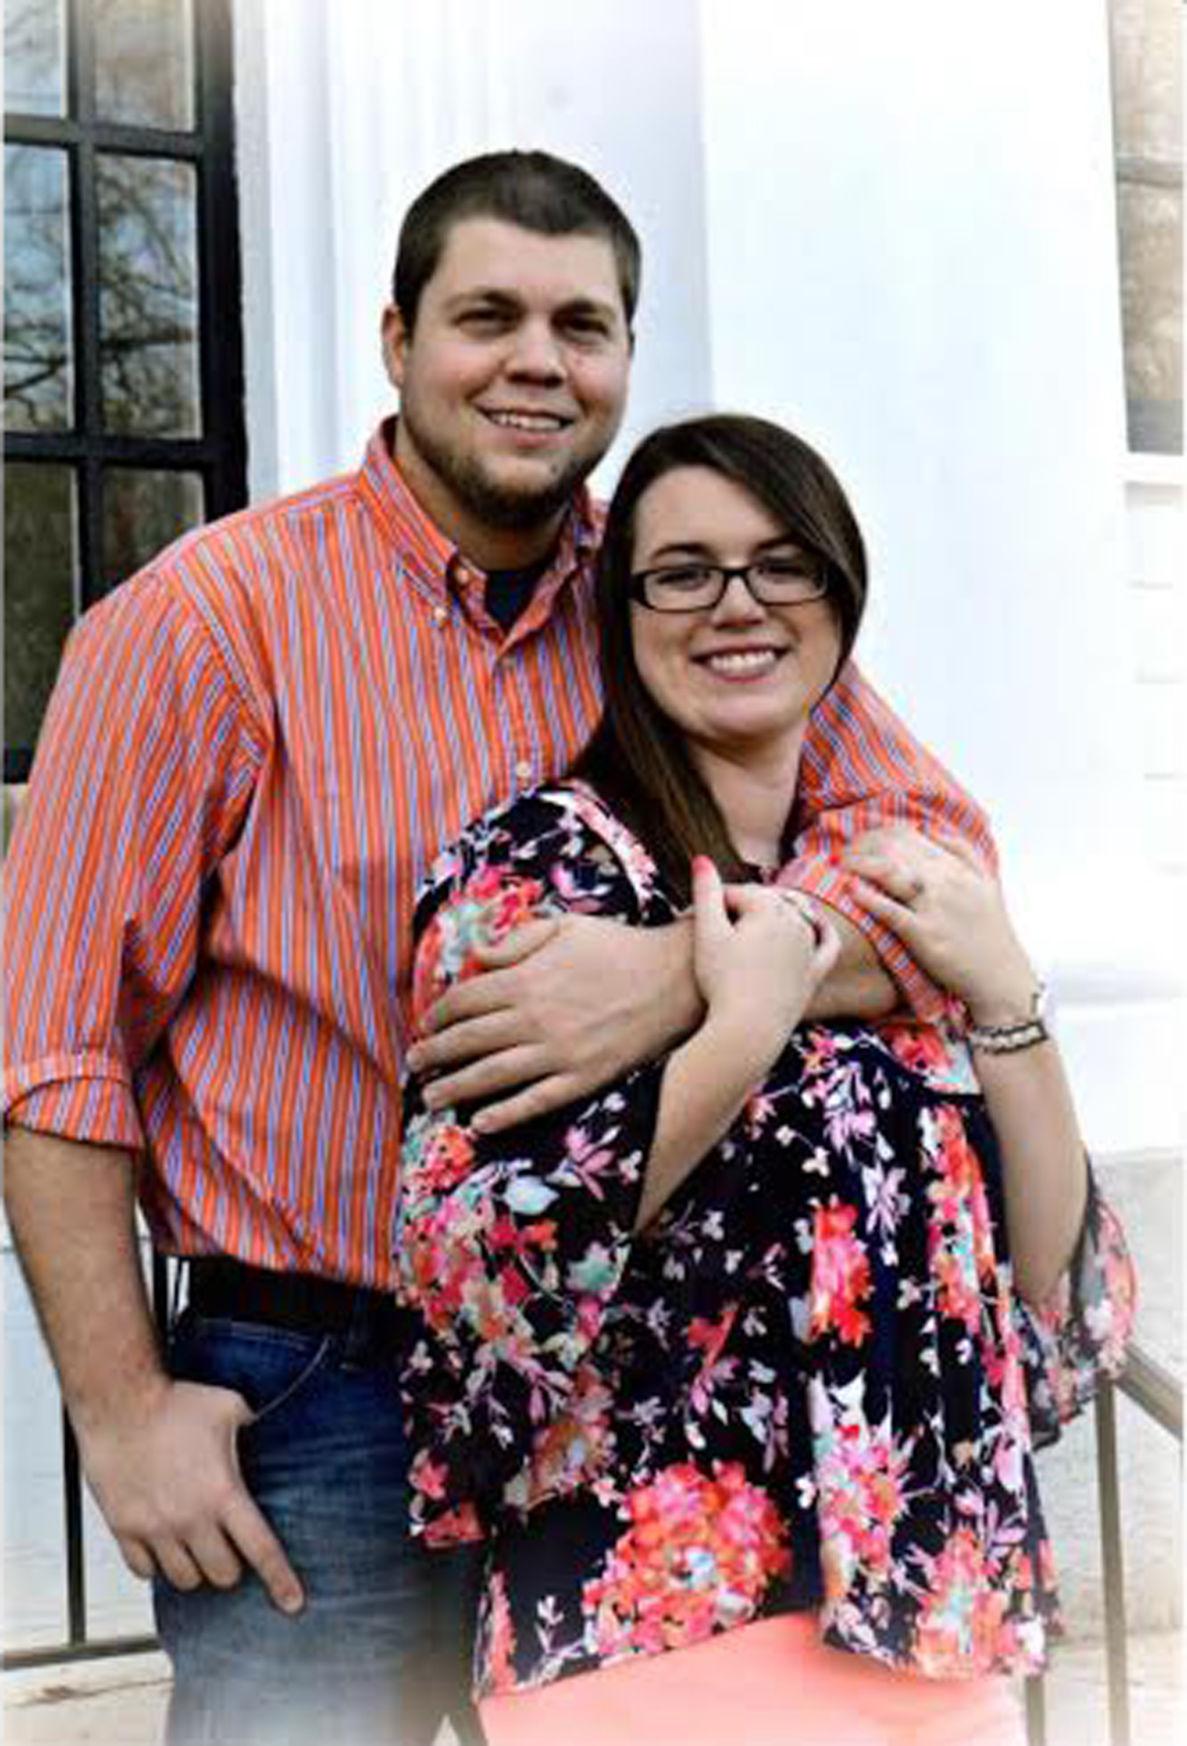 Emily Popham and Daniel Houston